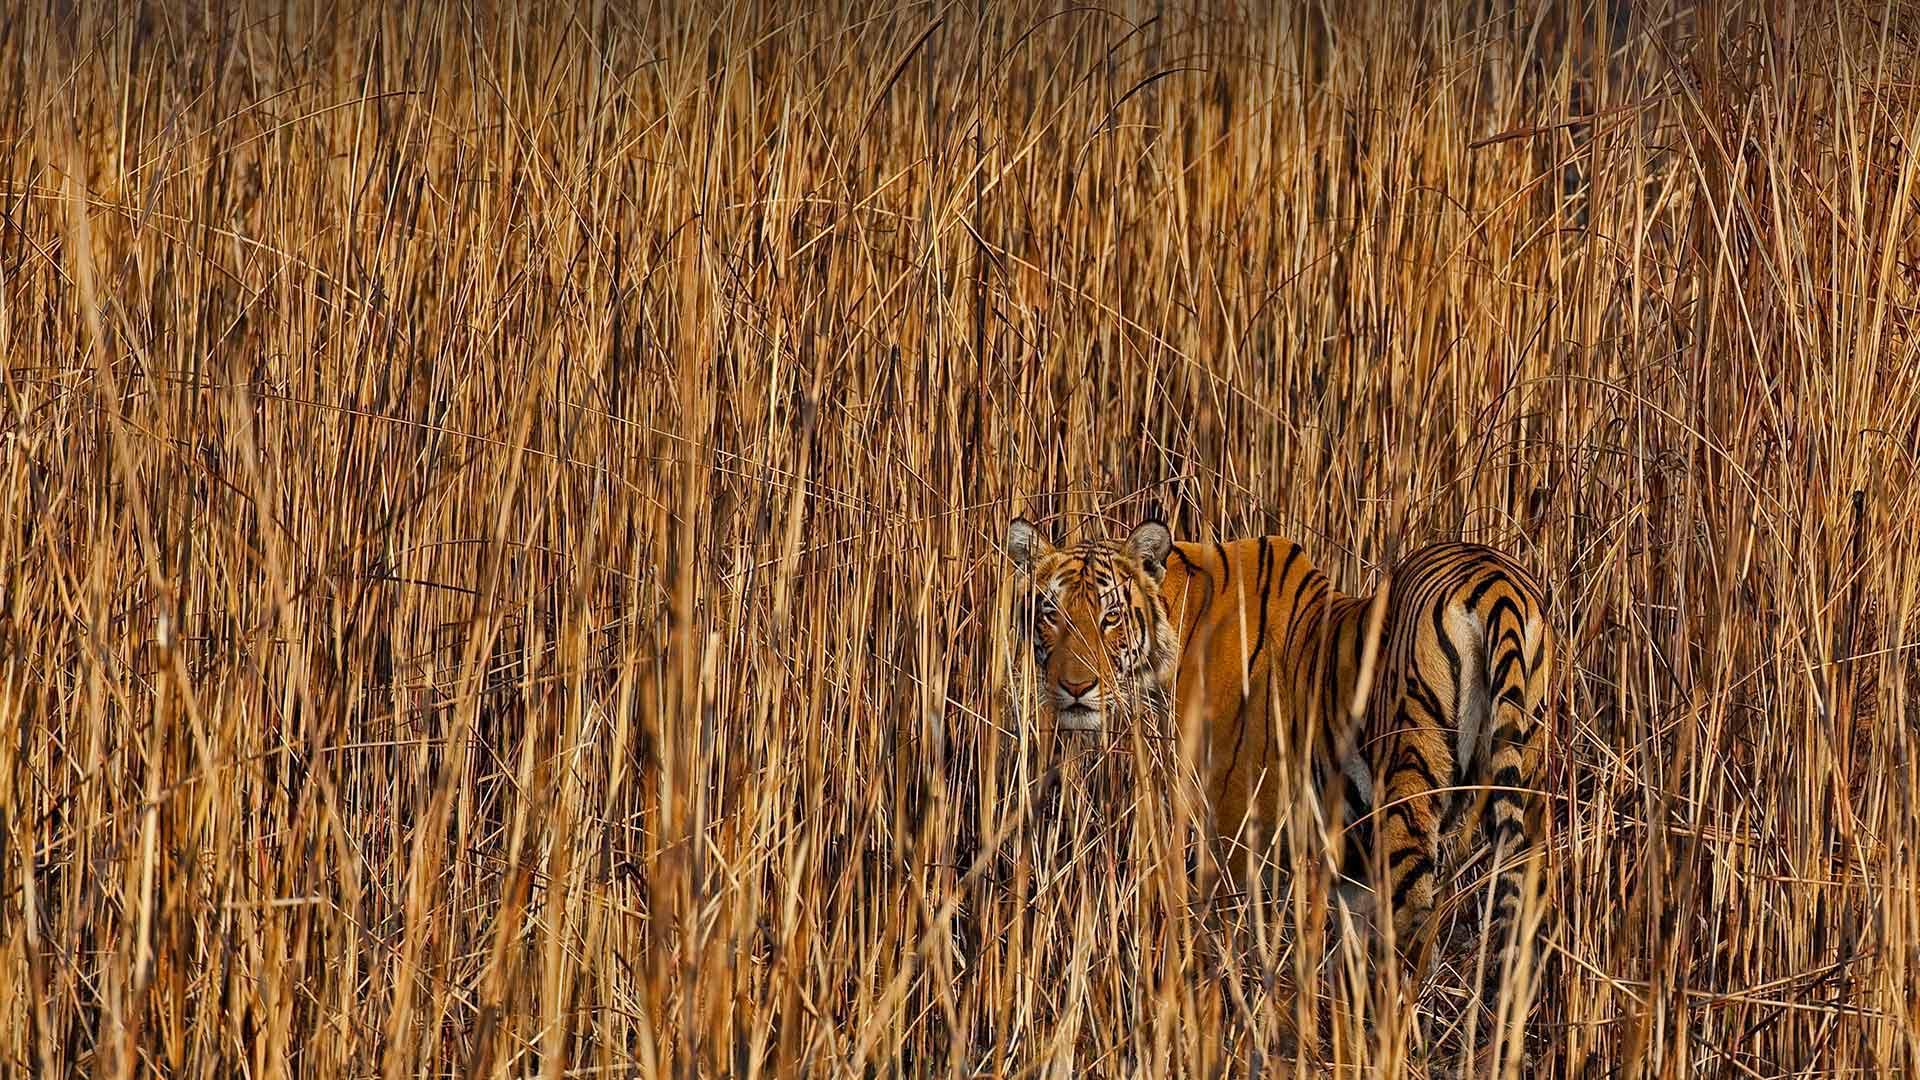 隐藏在高草丛中的老虎,印度阿萨姆邦 (© Sandesh Kadur/Minden Pictures)